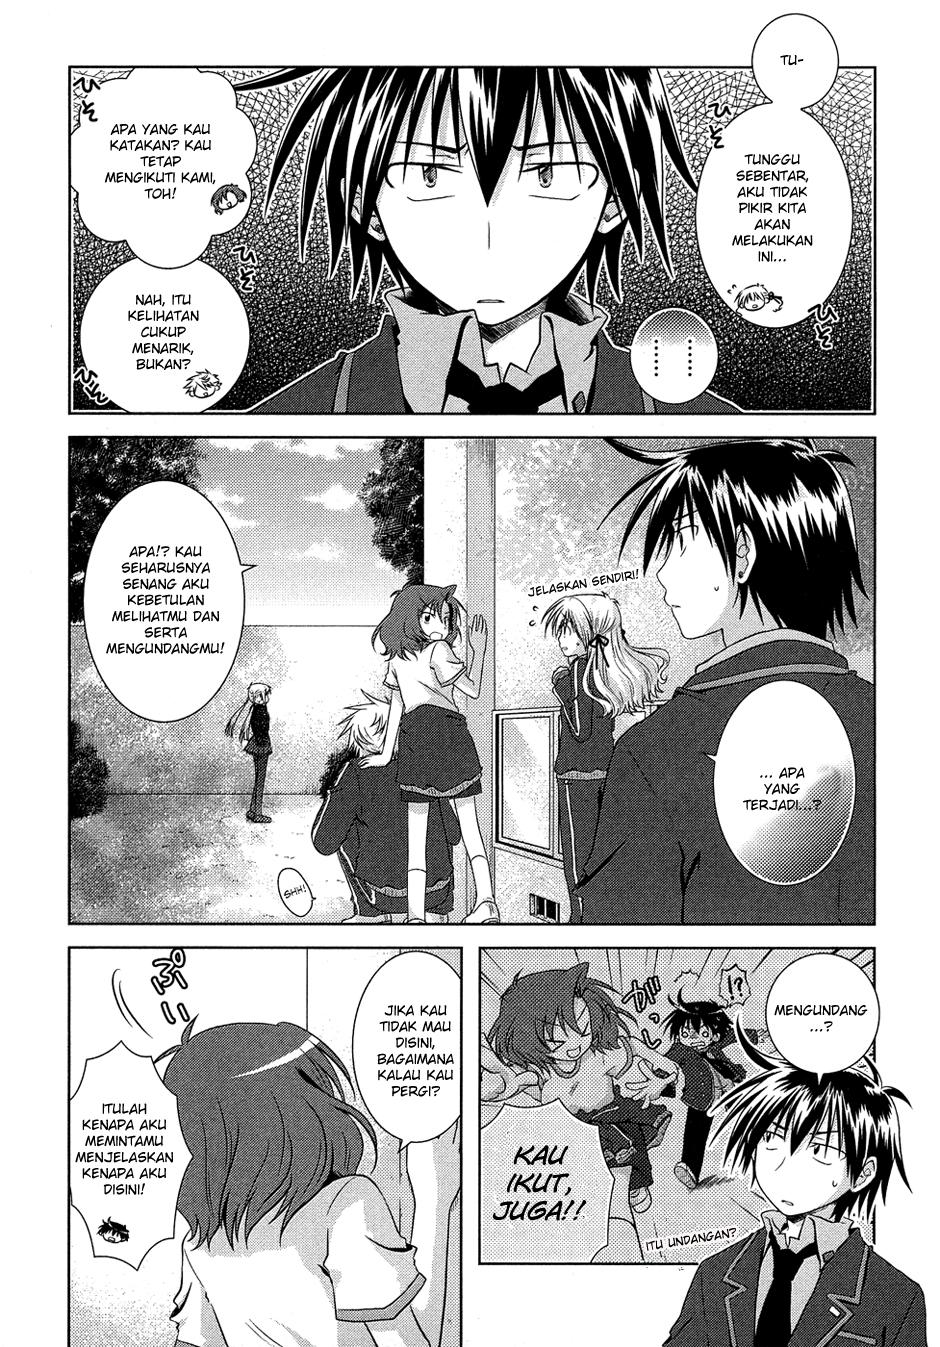 Komik iris zero 0010 11 Indonesia iris zero 0010 Terbaru 6|Baca Manga Komik Indonesia|